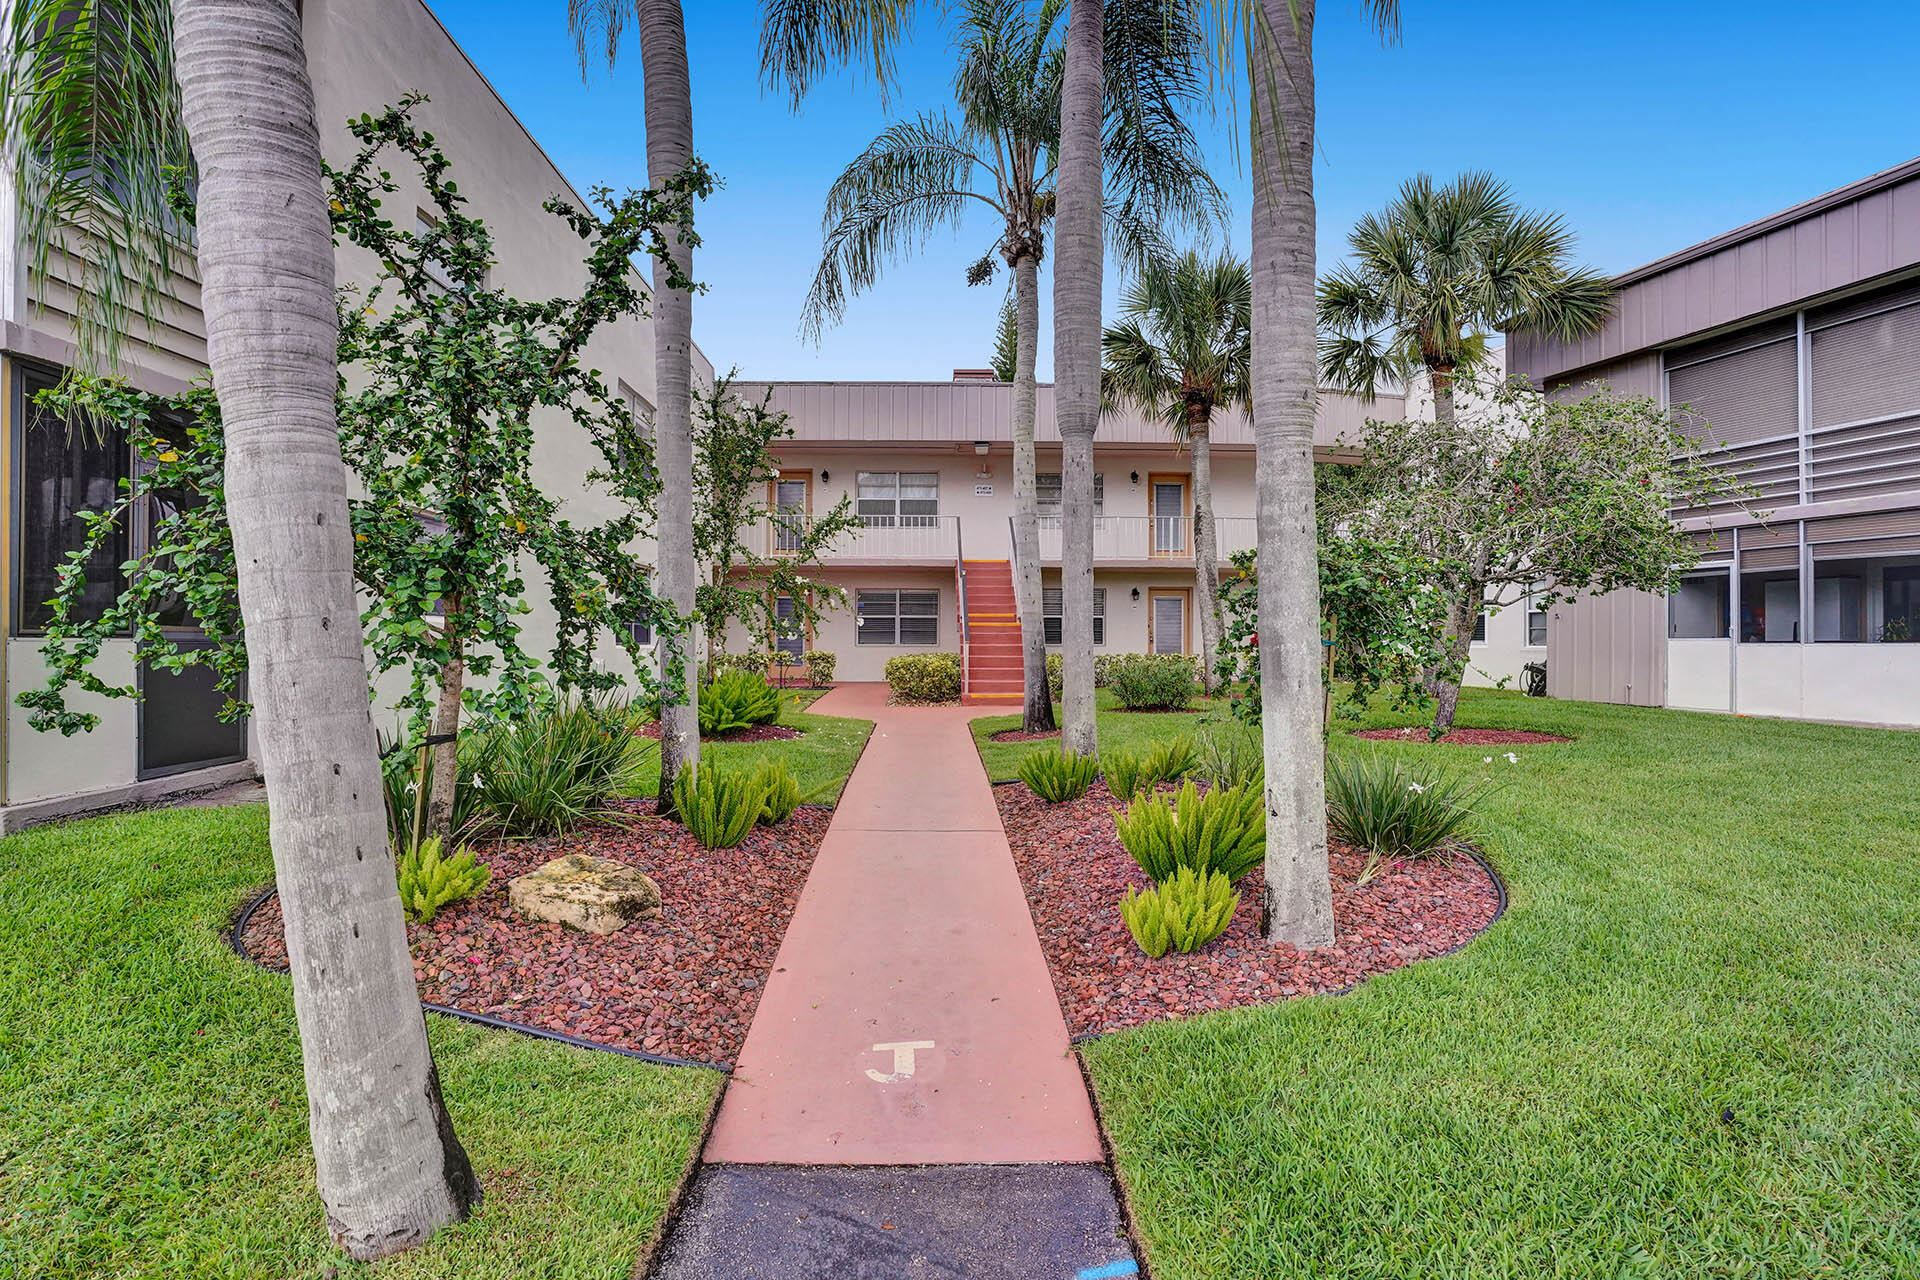 450 Capri J, Delray Beach, FL 33484 - MLS#: RX-10730070